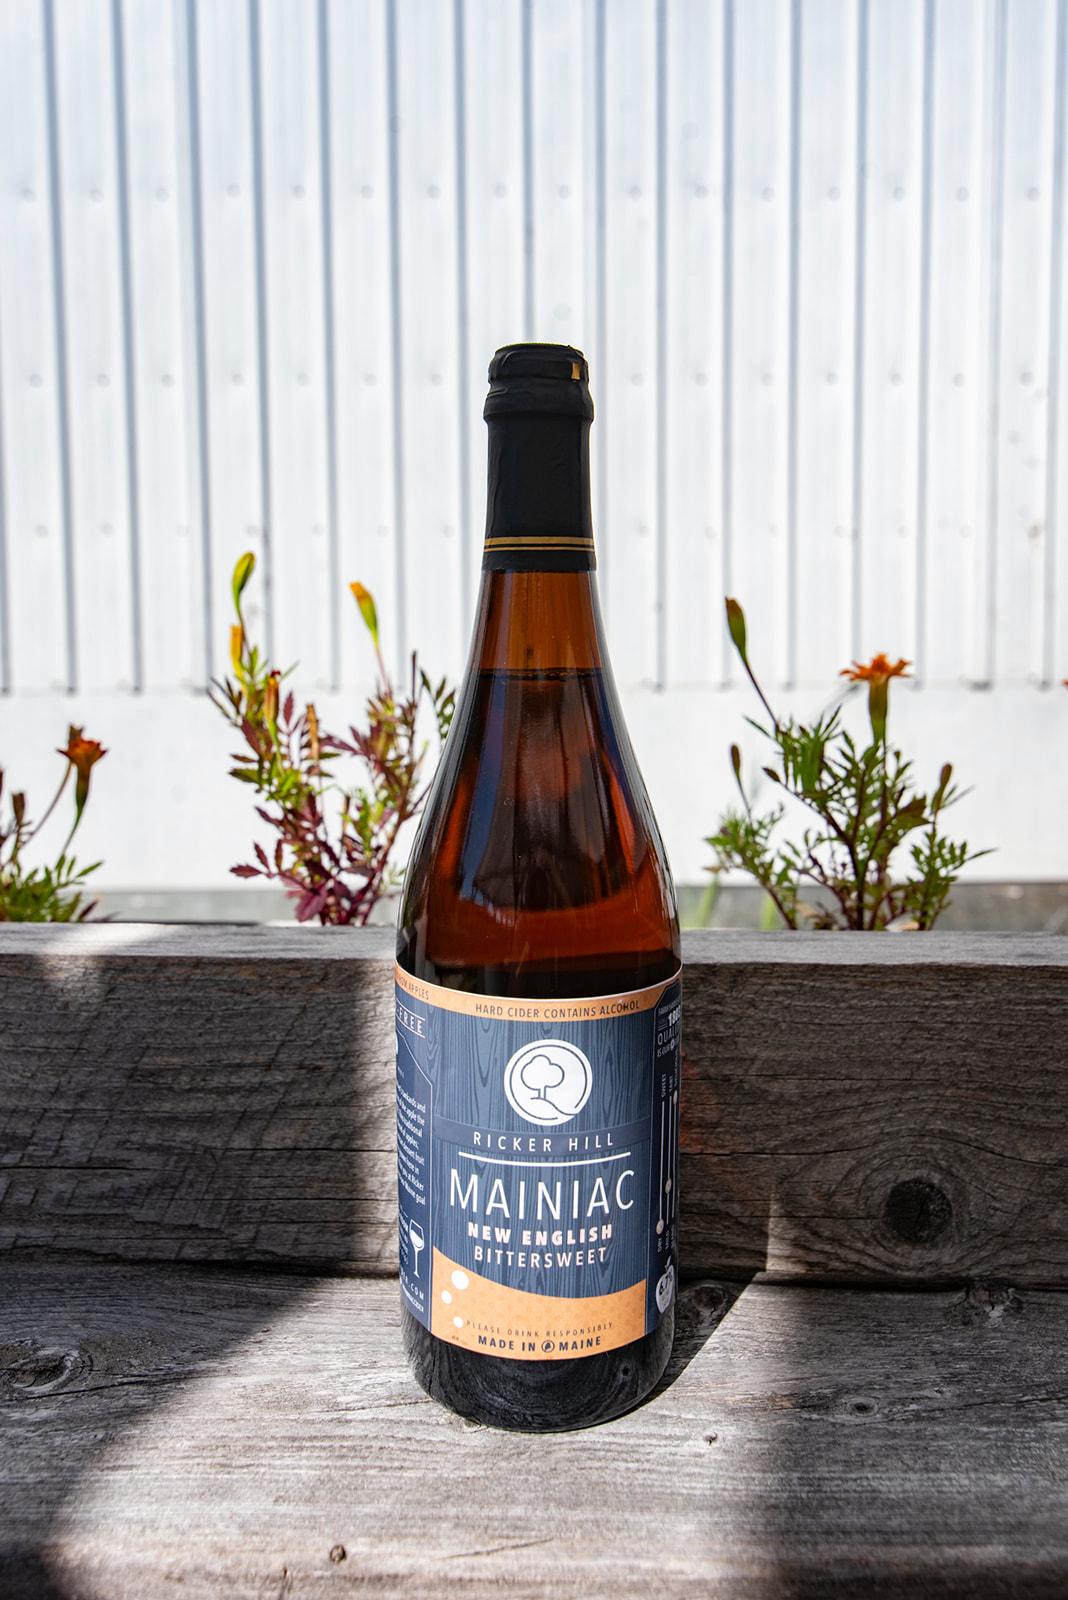 Ricker Hill Mainiac New English Bittersweet hard cider